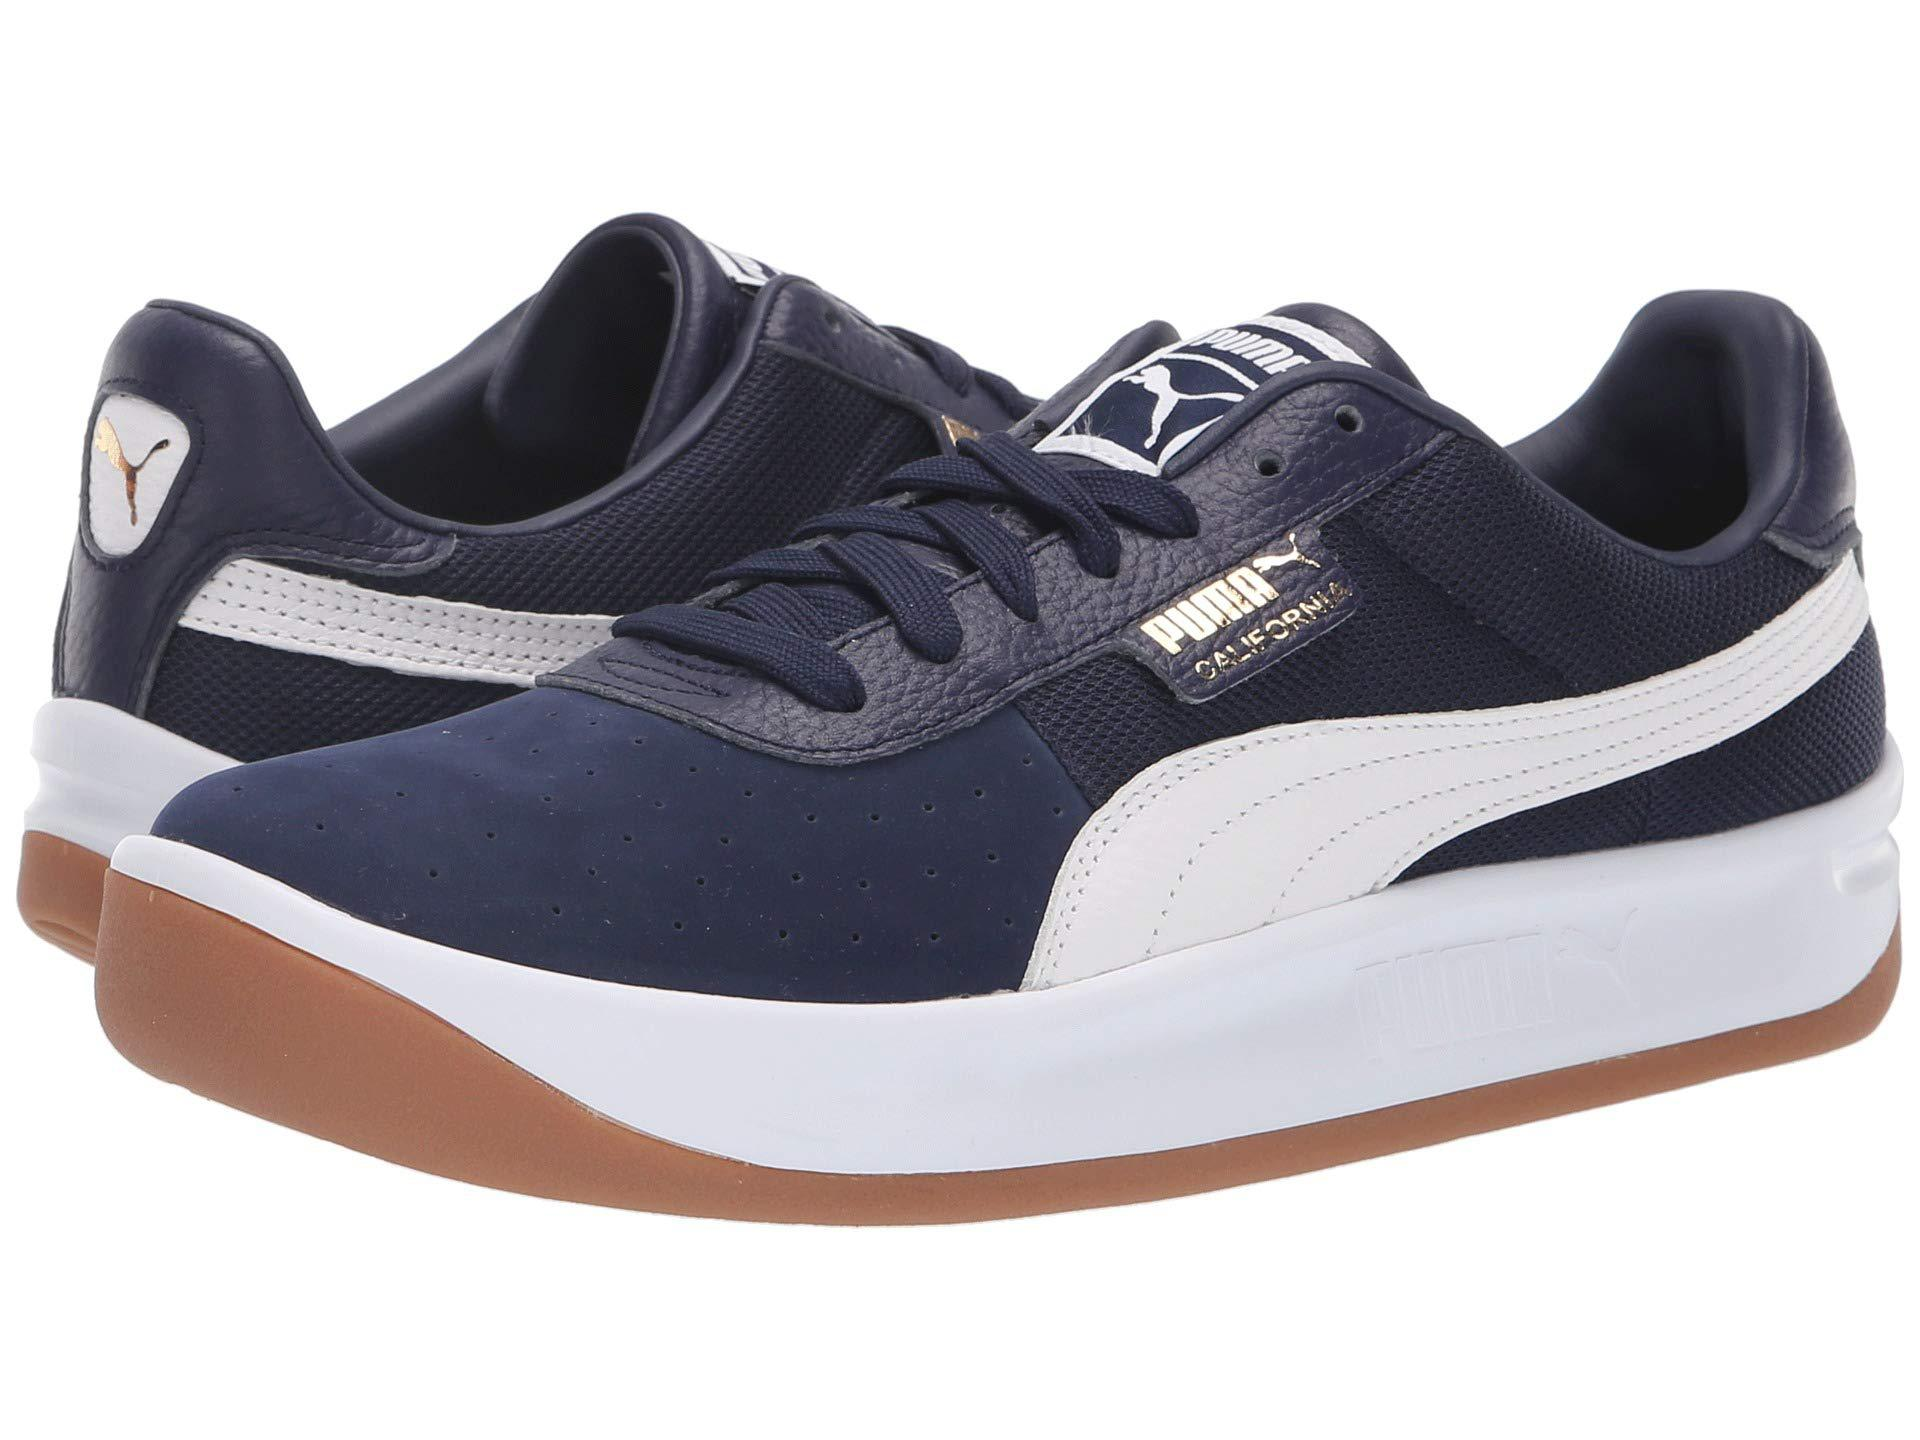 Lyst - PUMA California Casual ( White peacoat  White) Men s Shoes in ... 6e27b8888